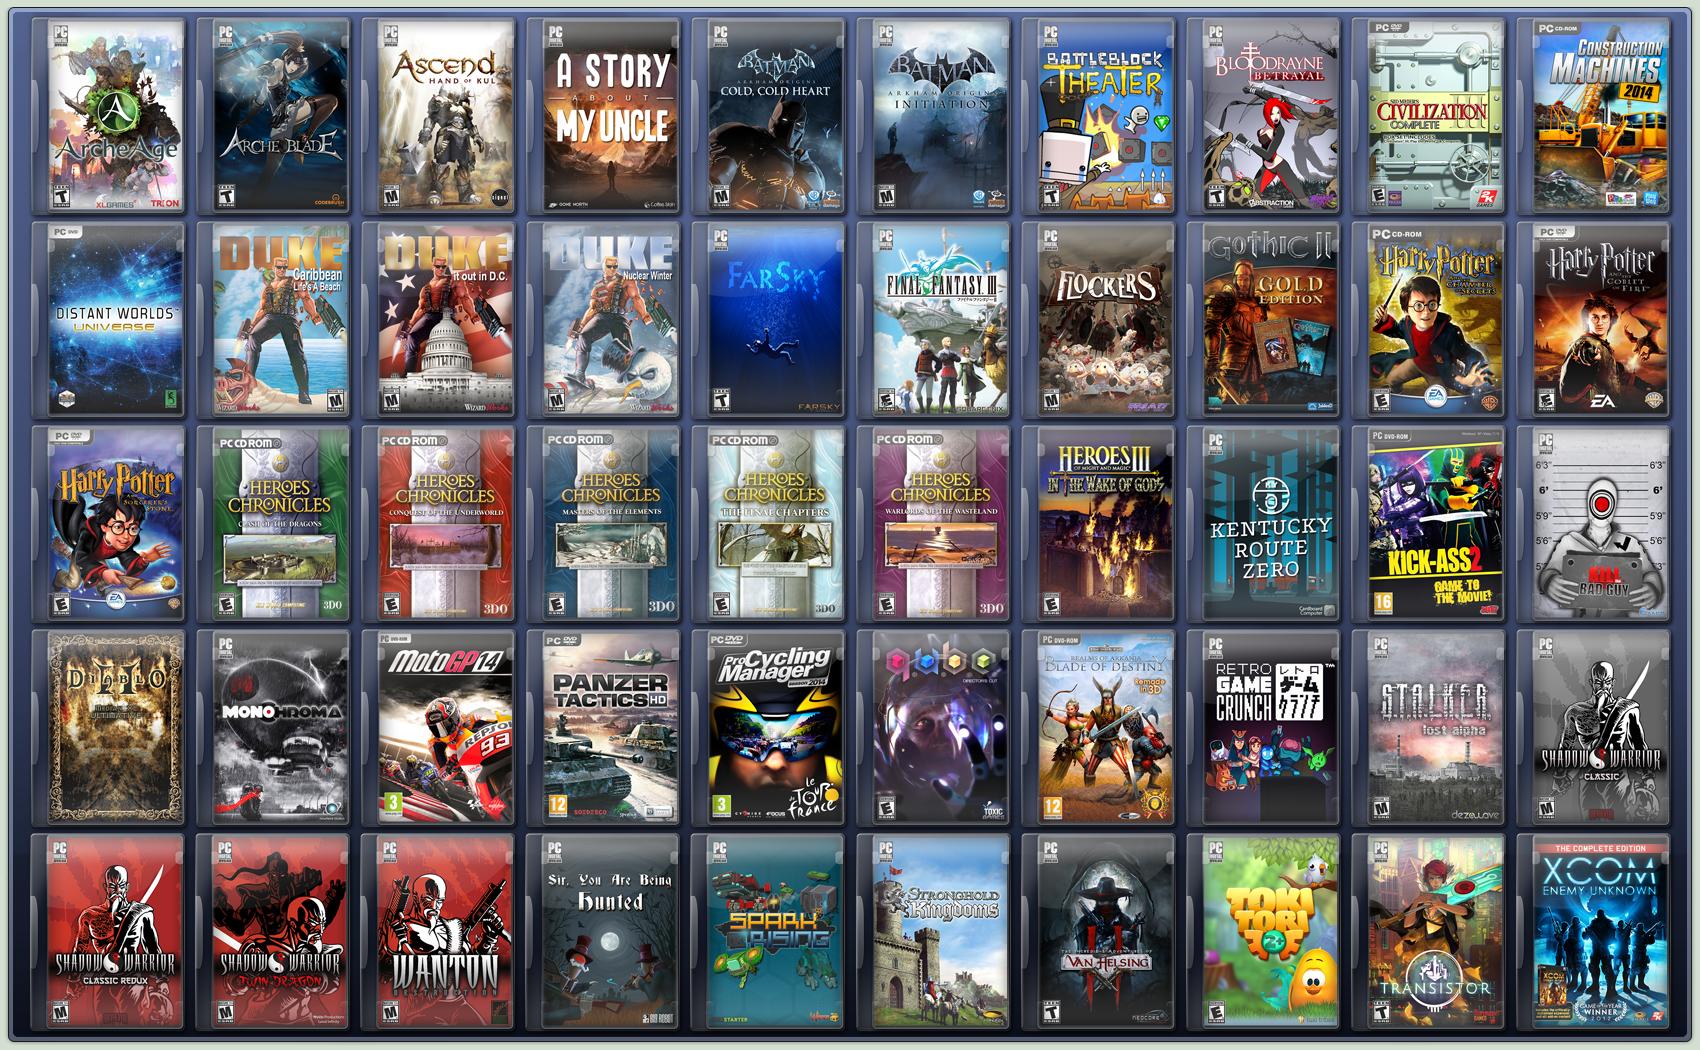 Games icon deviantart chromecast : Bitjob token key 80